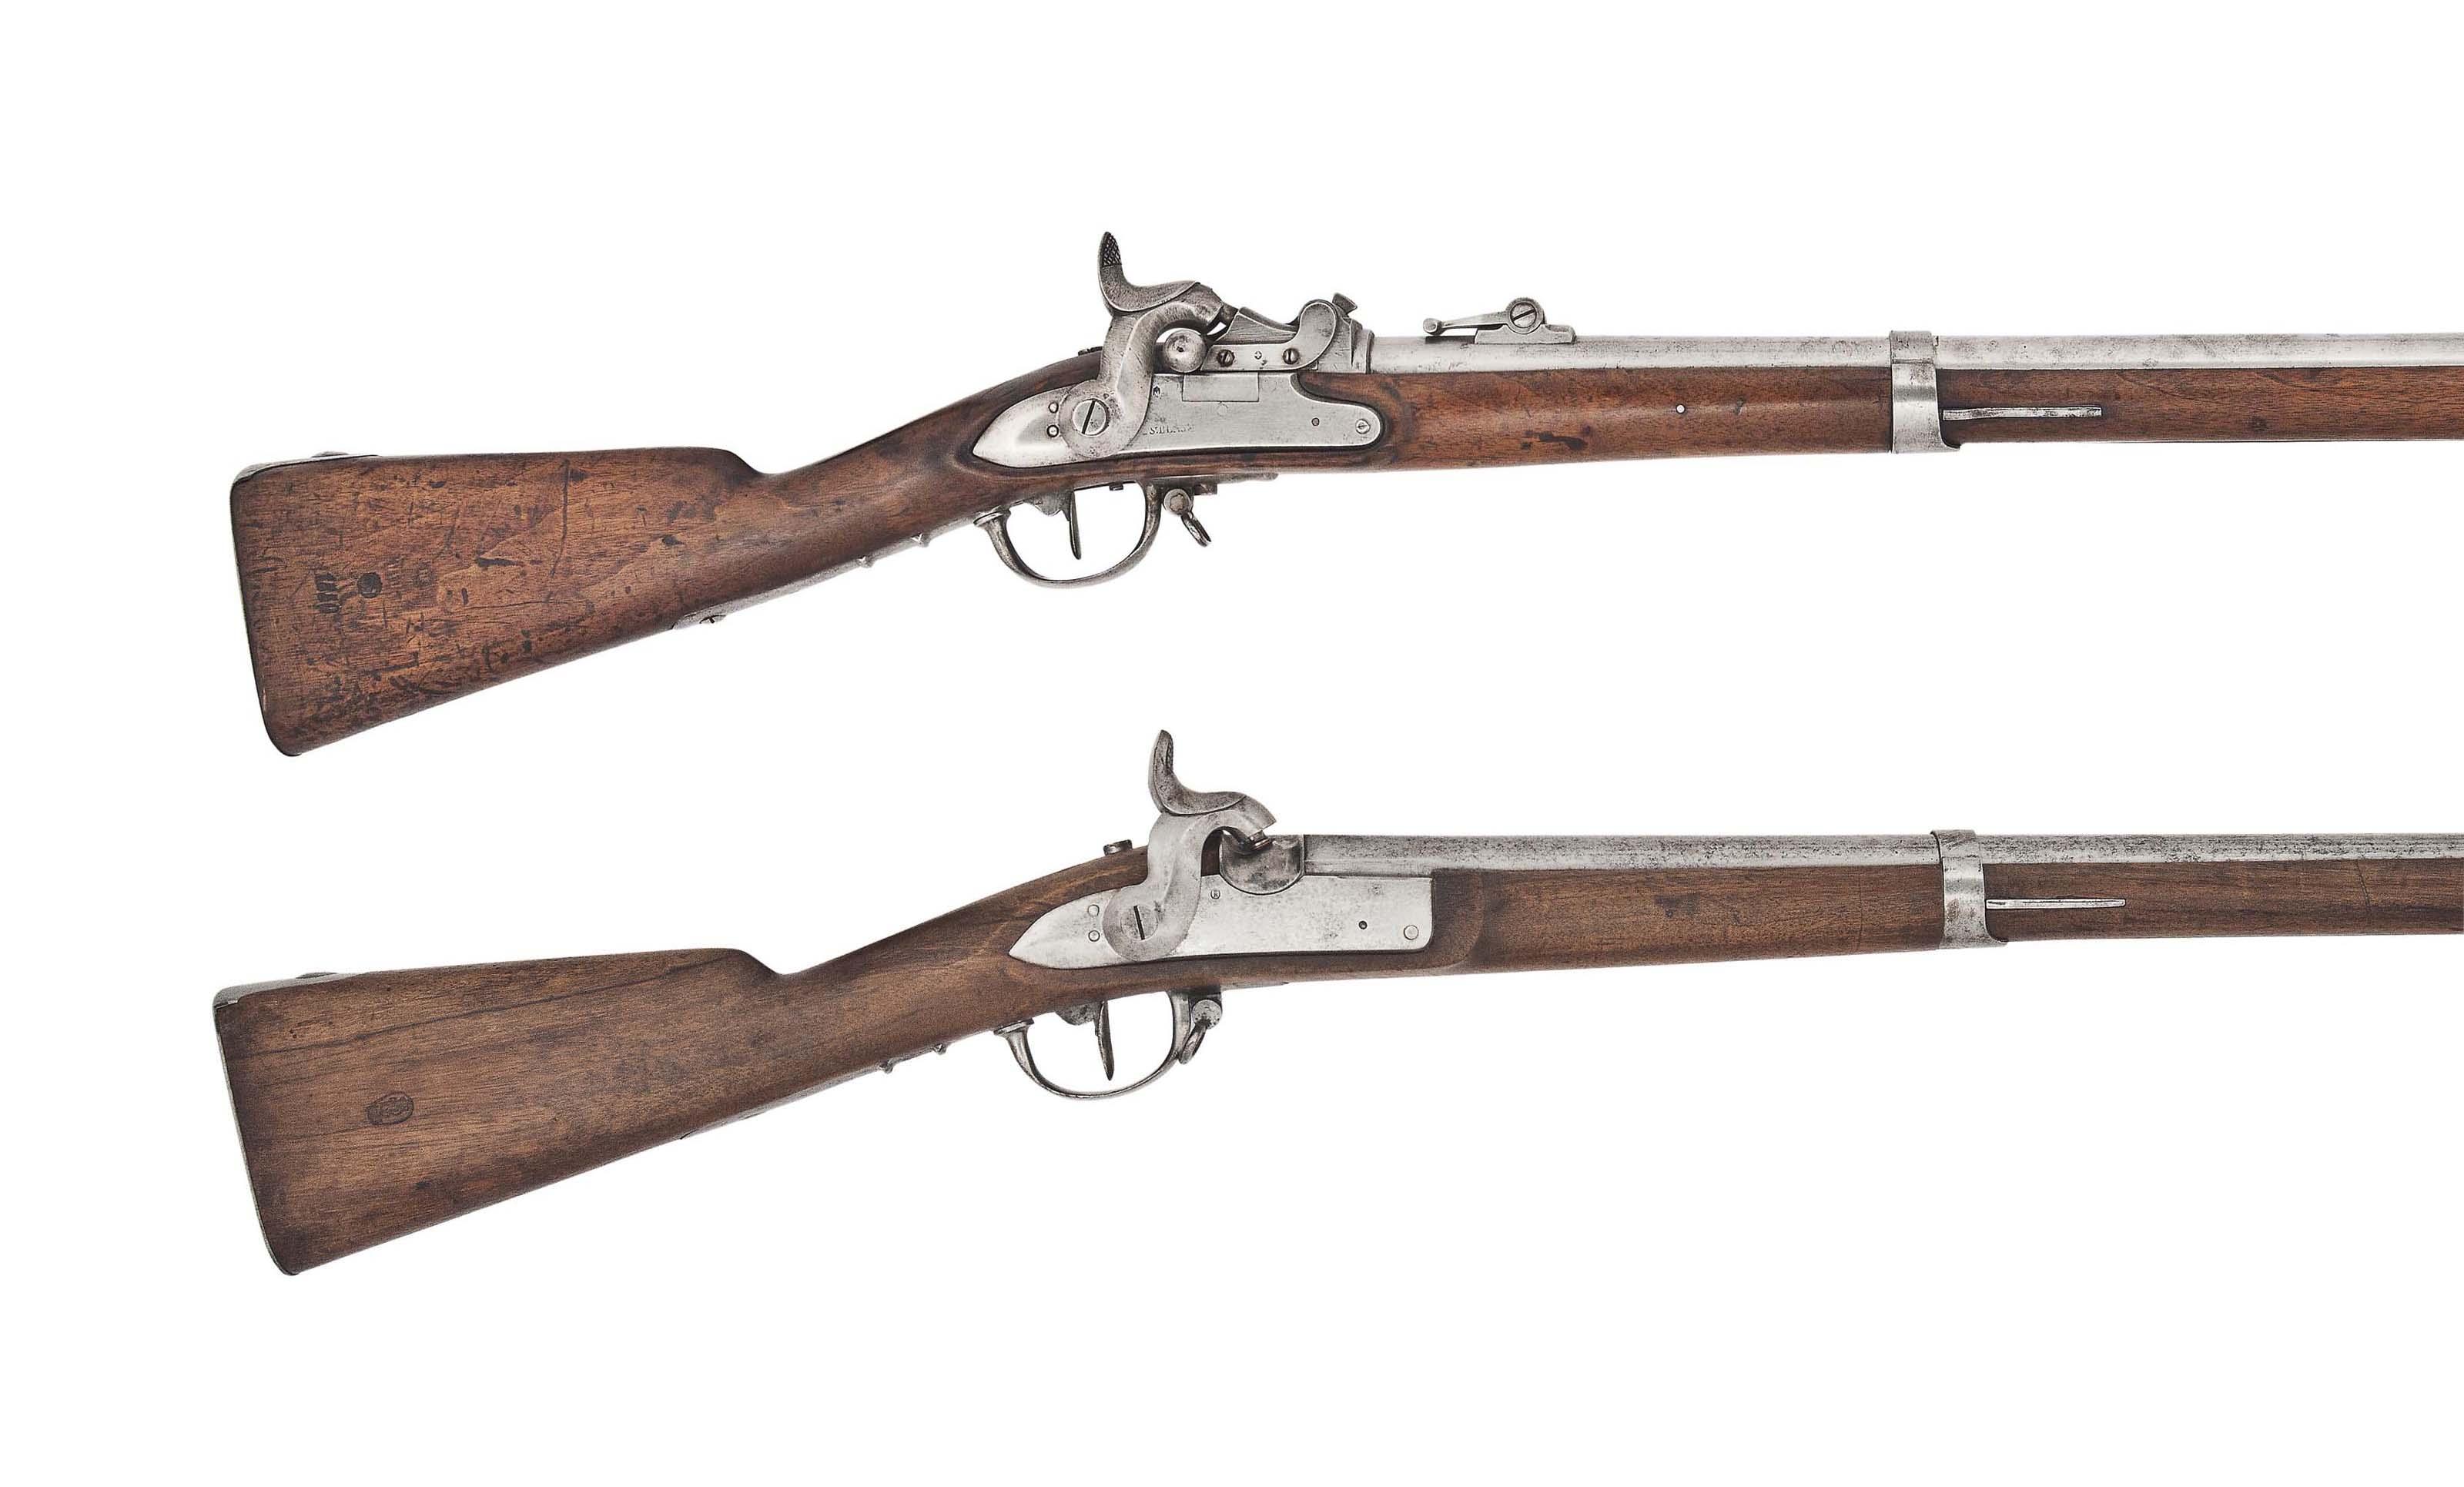 A SWISS 18mm (RIMFIRE) 'MODEL 1842/59/67' MILLBANK AMSLER CONVERSION RIFLED MUSKET